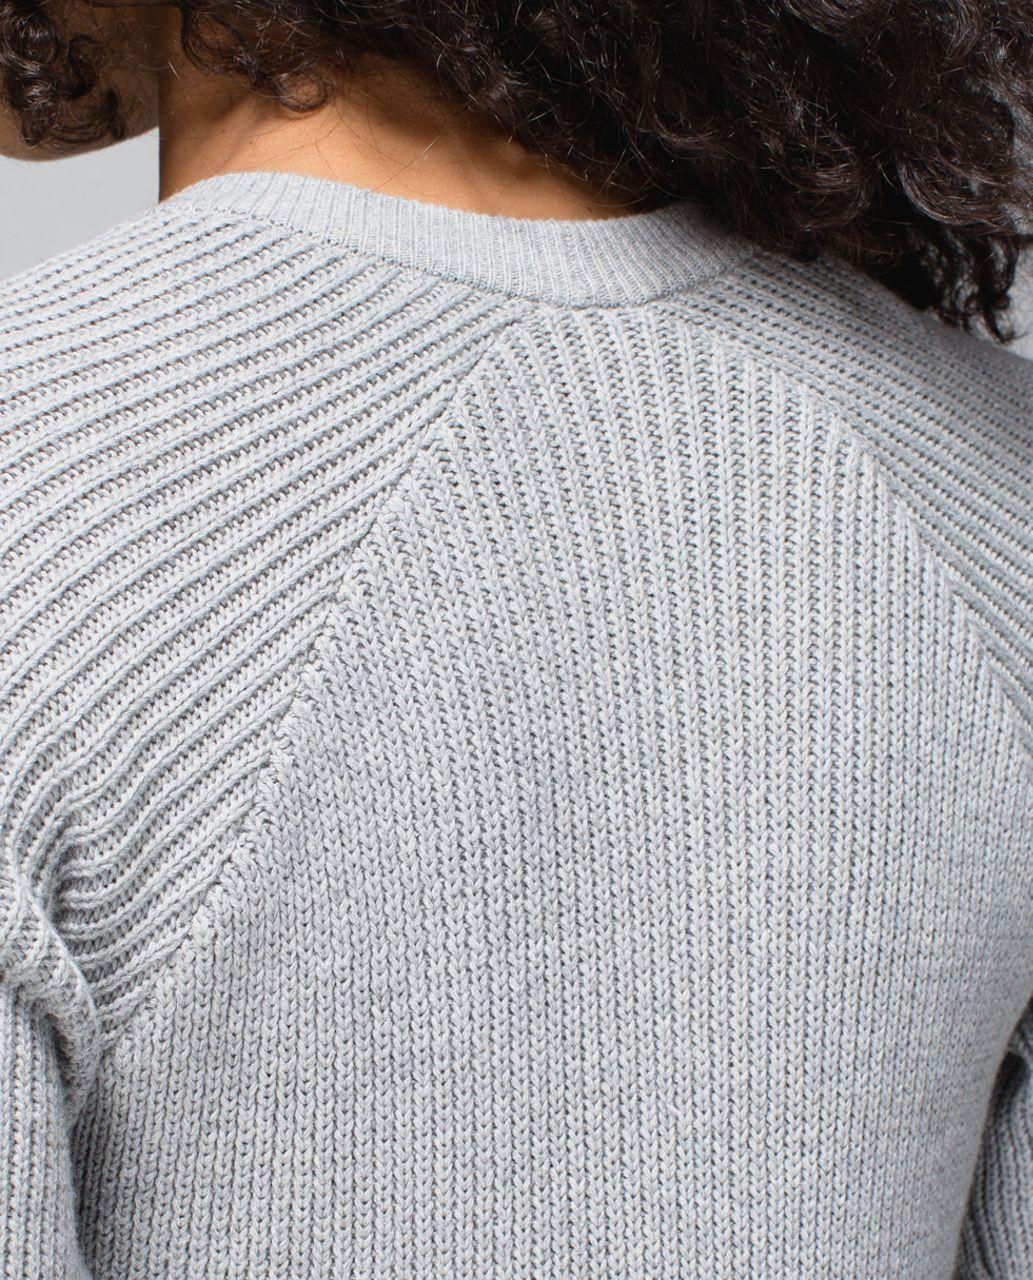 Lululemon The Sweater The Better - Heathered Medium Grey